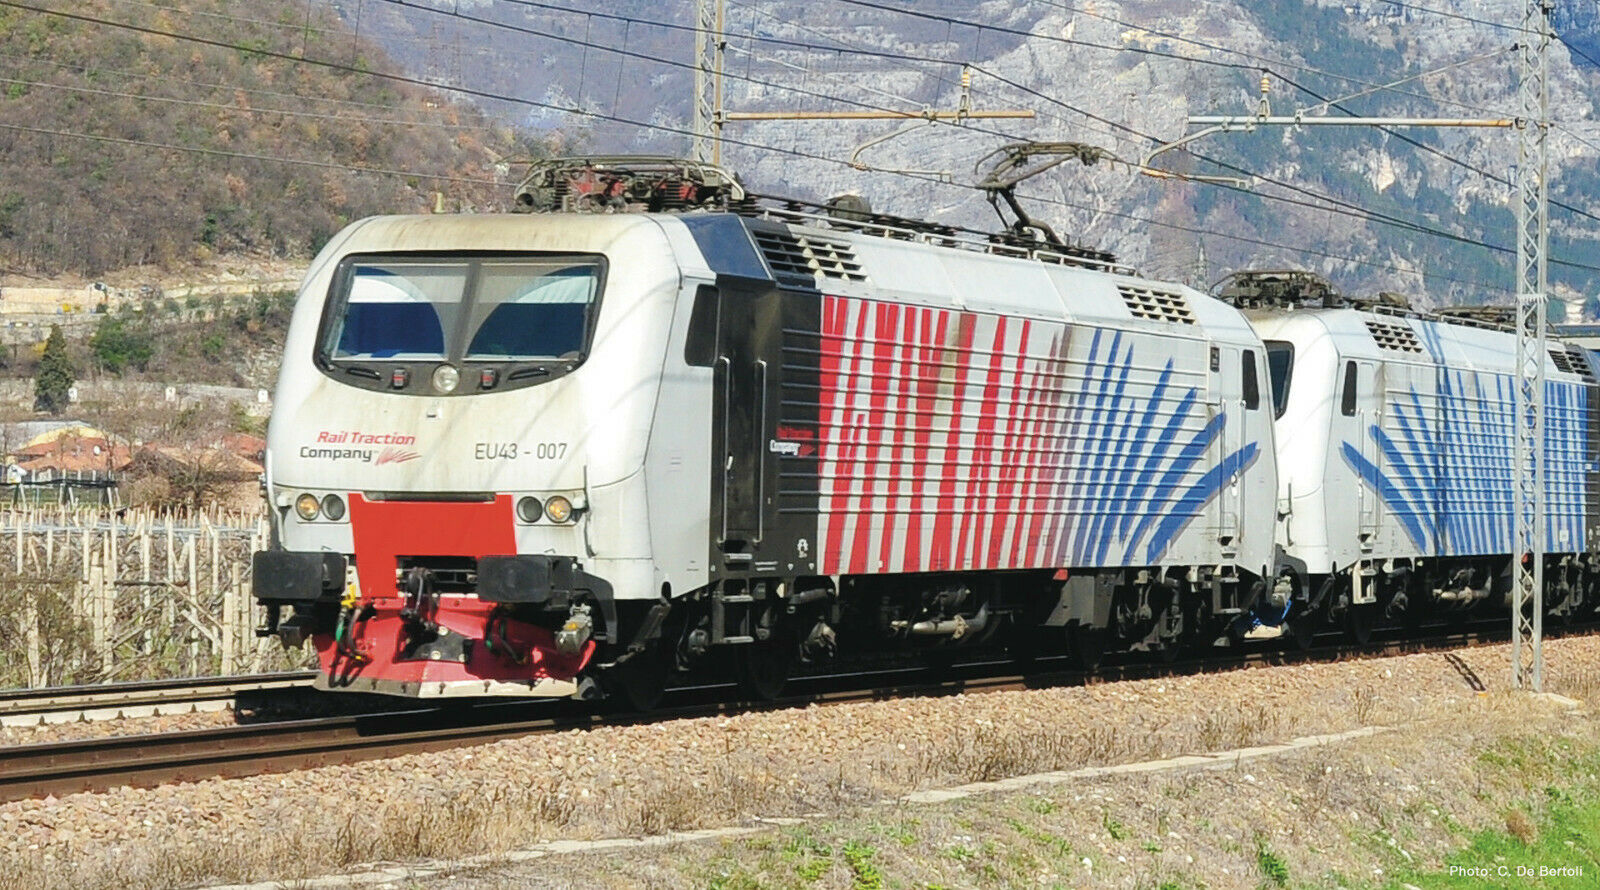 ROCO 73679-elektrolokomotive UE 43-007, Lokomotion, Zebra, DSS, novità 2019